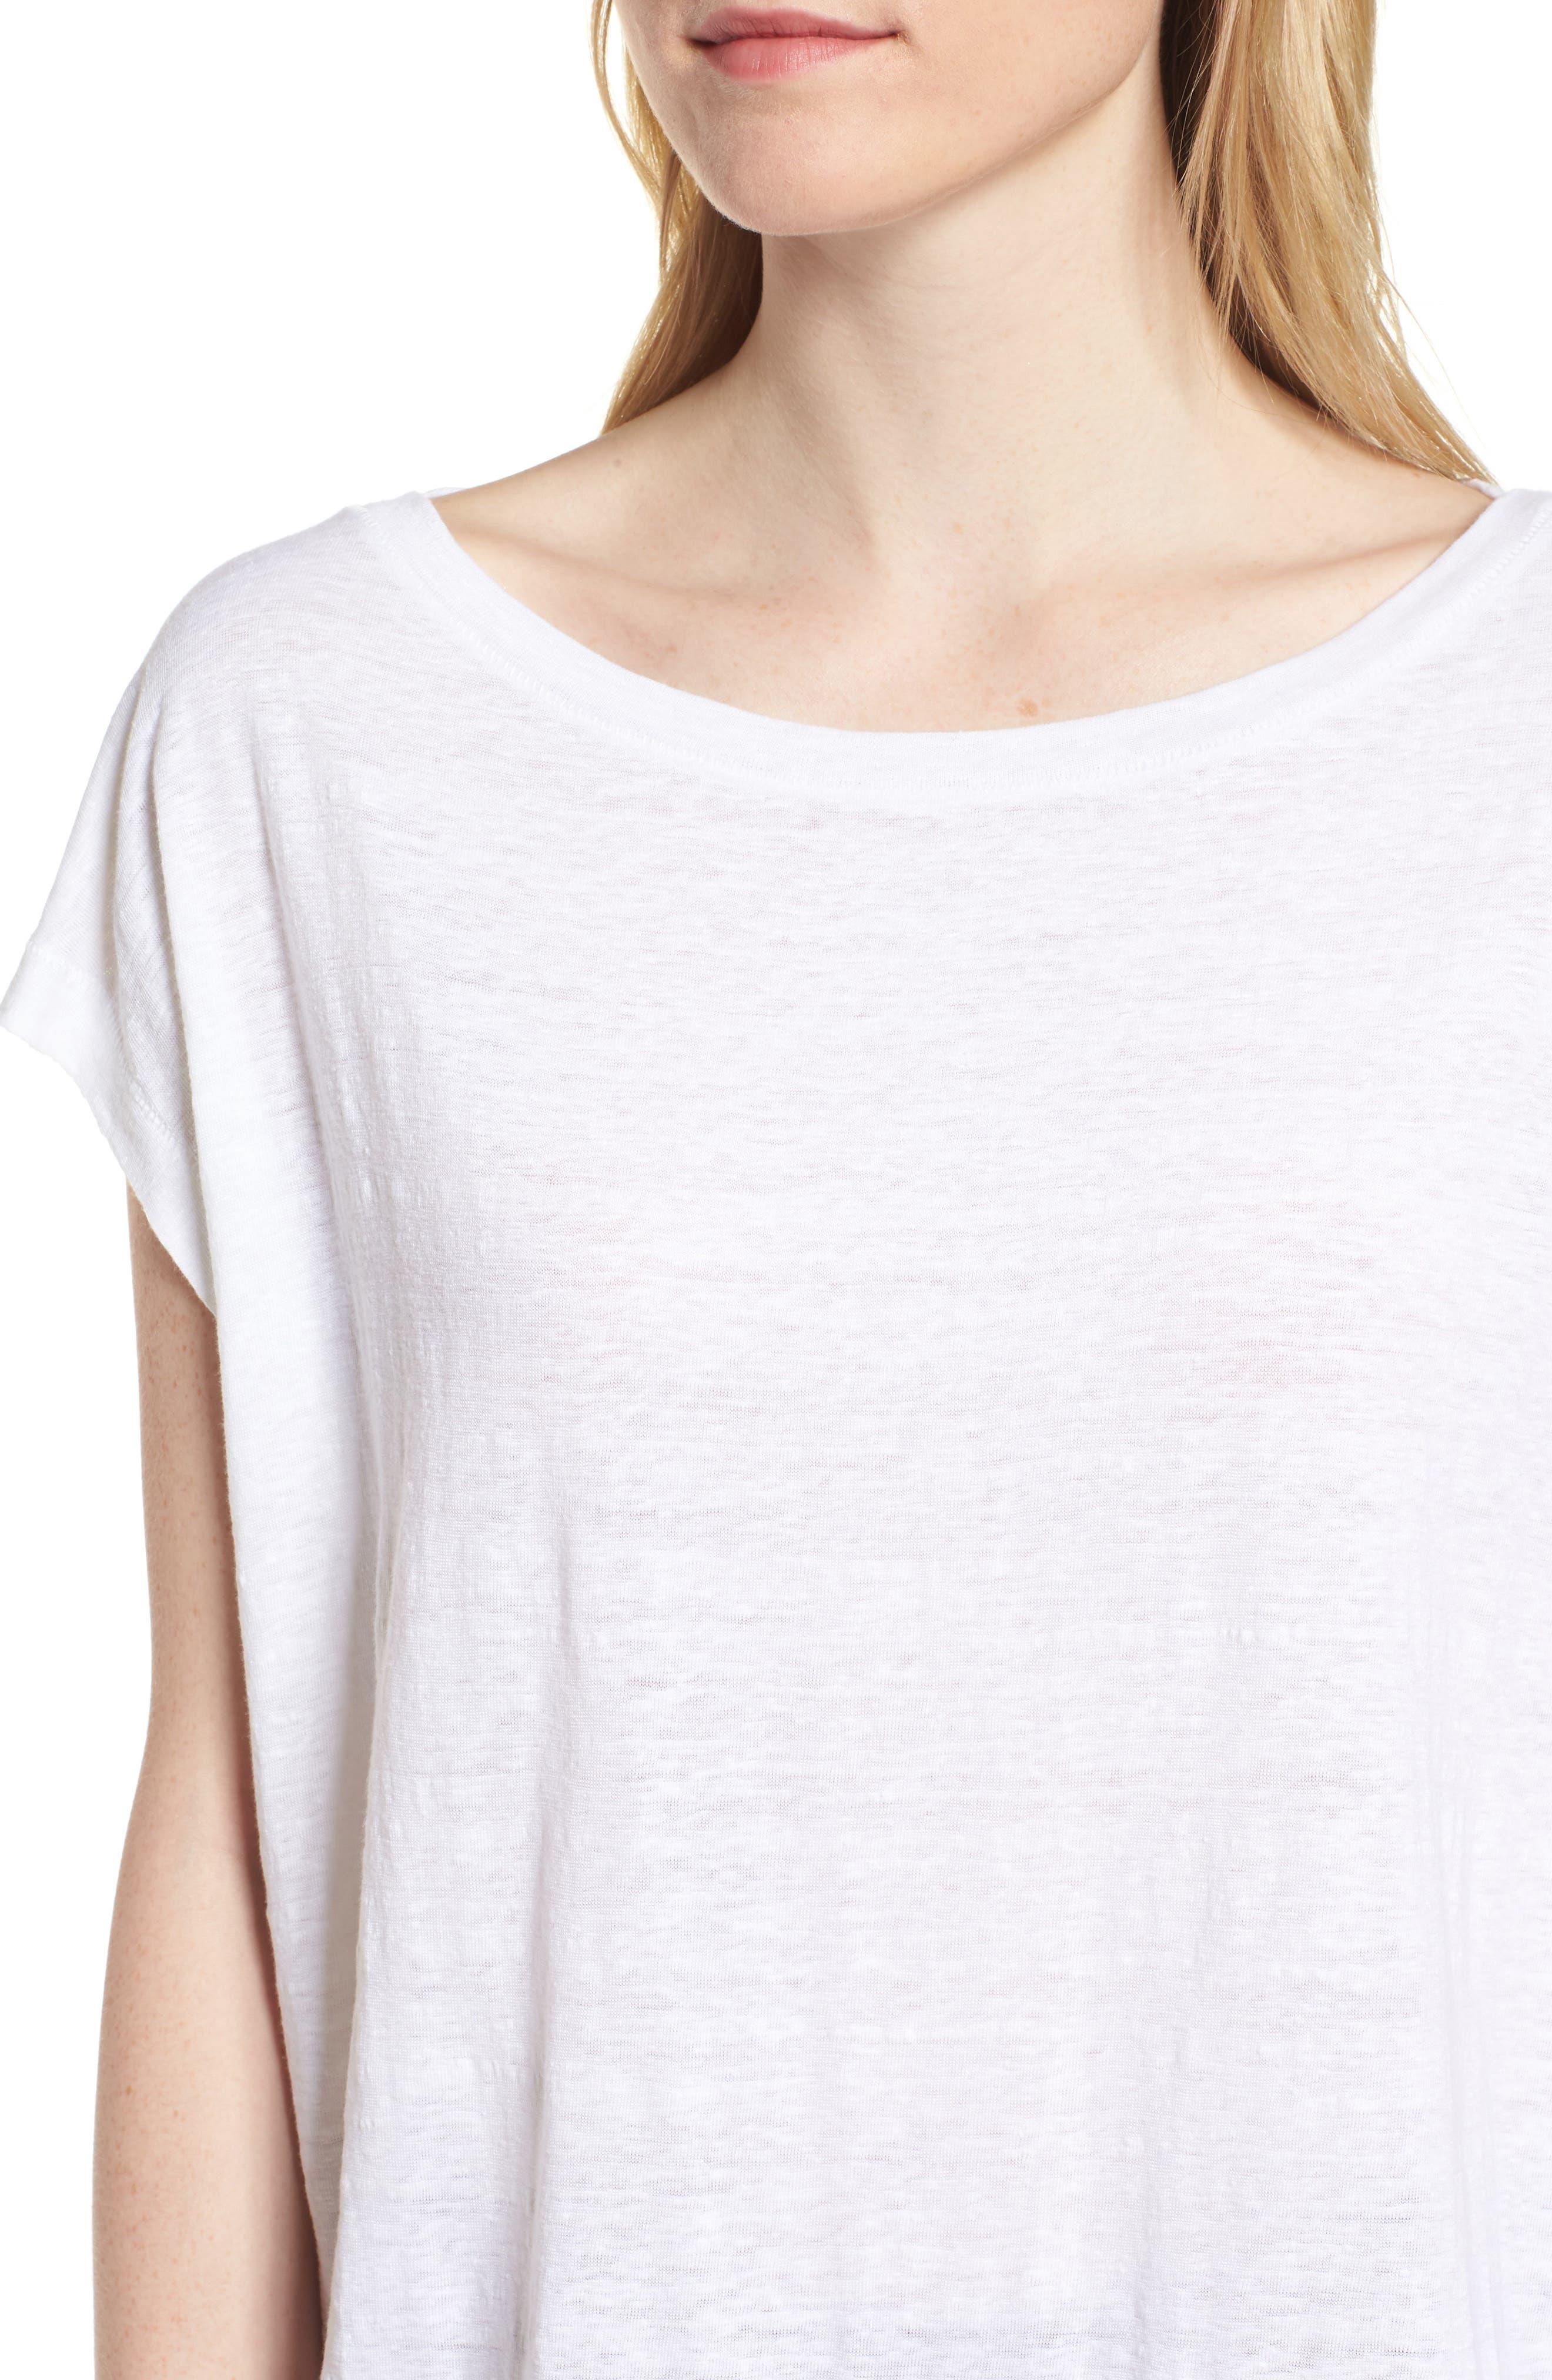 Organic Linen Top,                             Alternate thumbnail 4, color,                             100